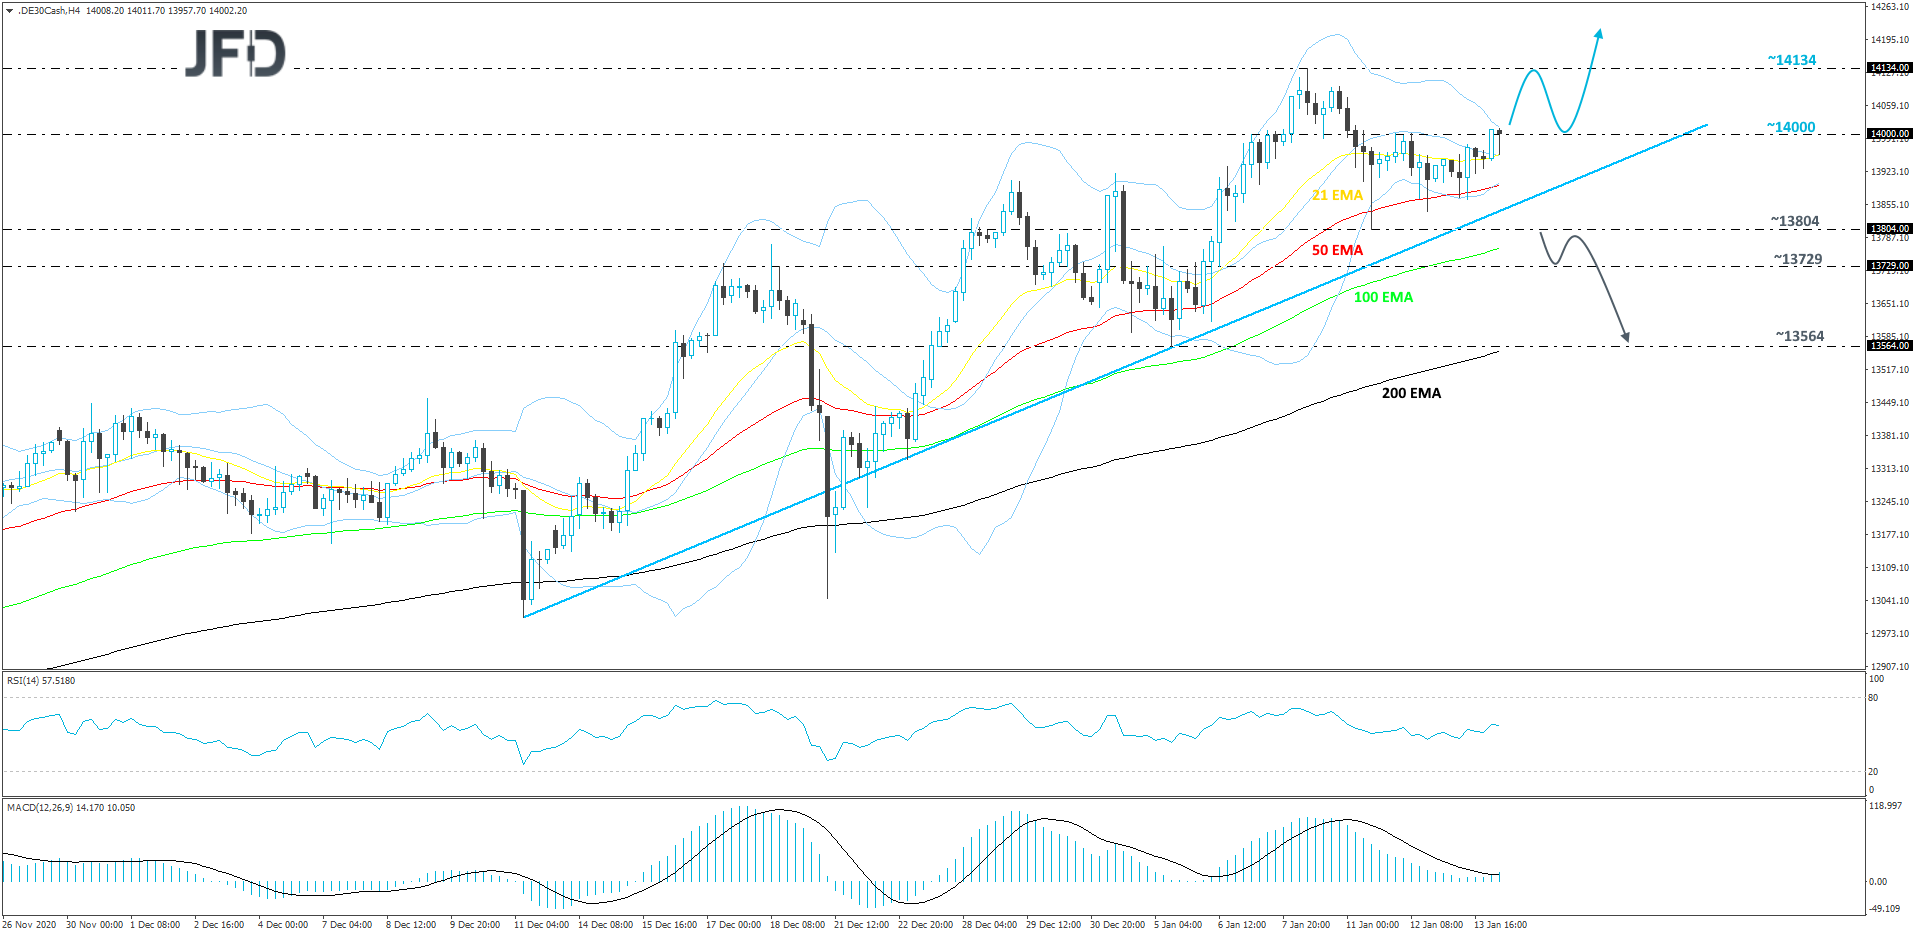 German DAX 4-hour chart technical analysis